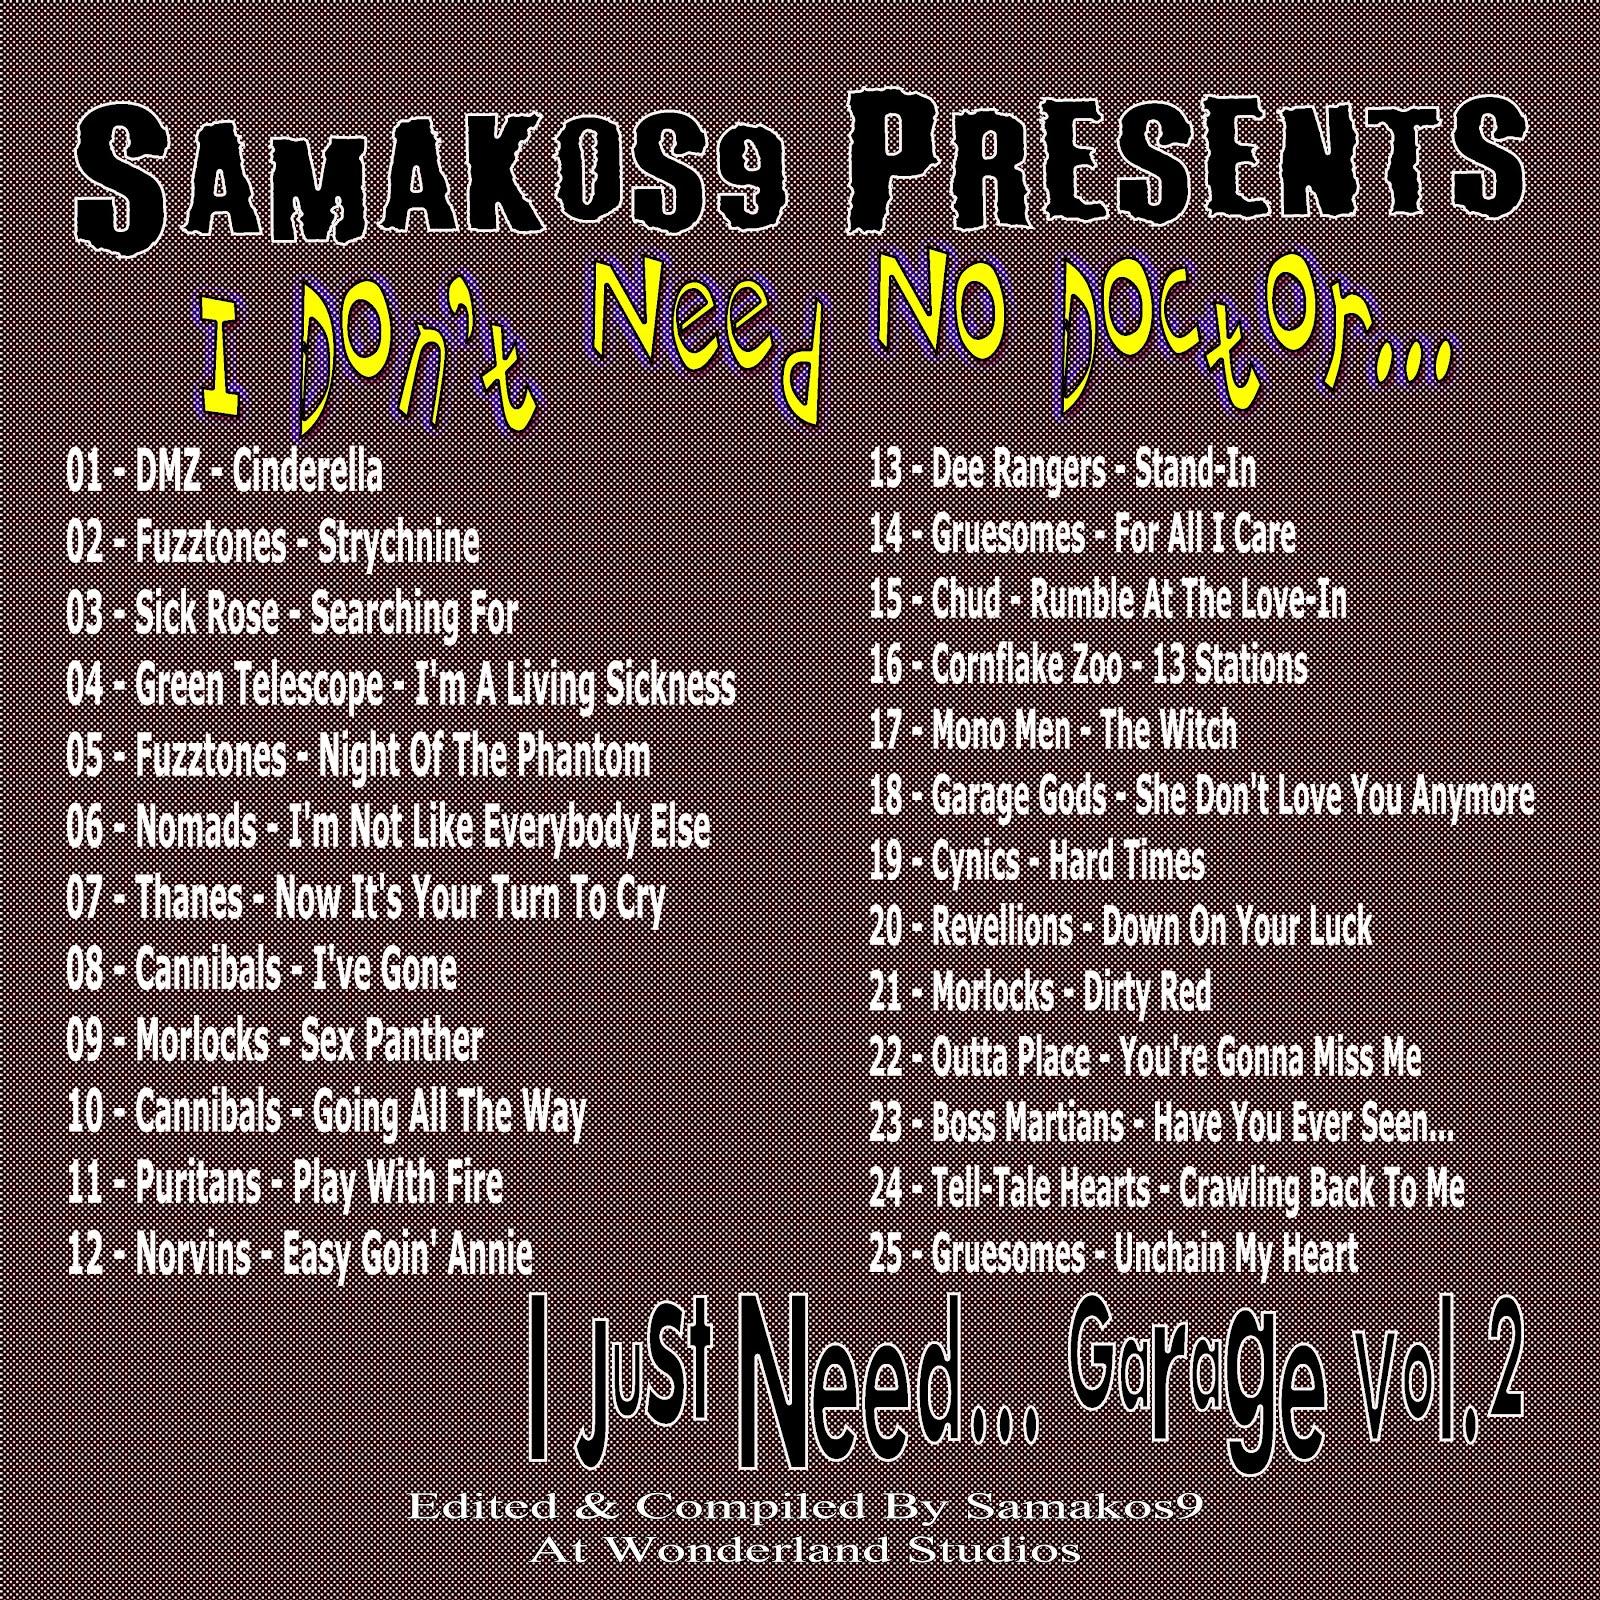 BOOZETUNES: Samakos9 Presents - I Don't Need No Doctor Vol.2